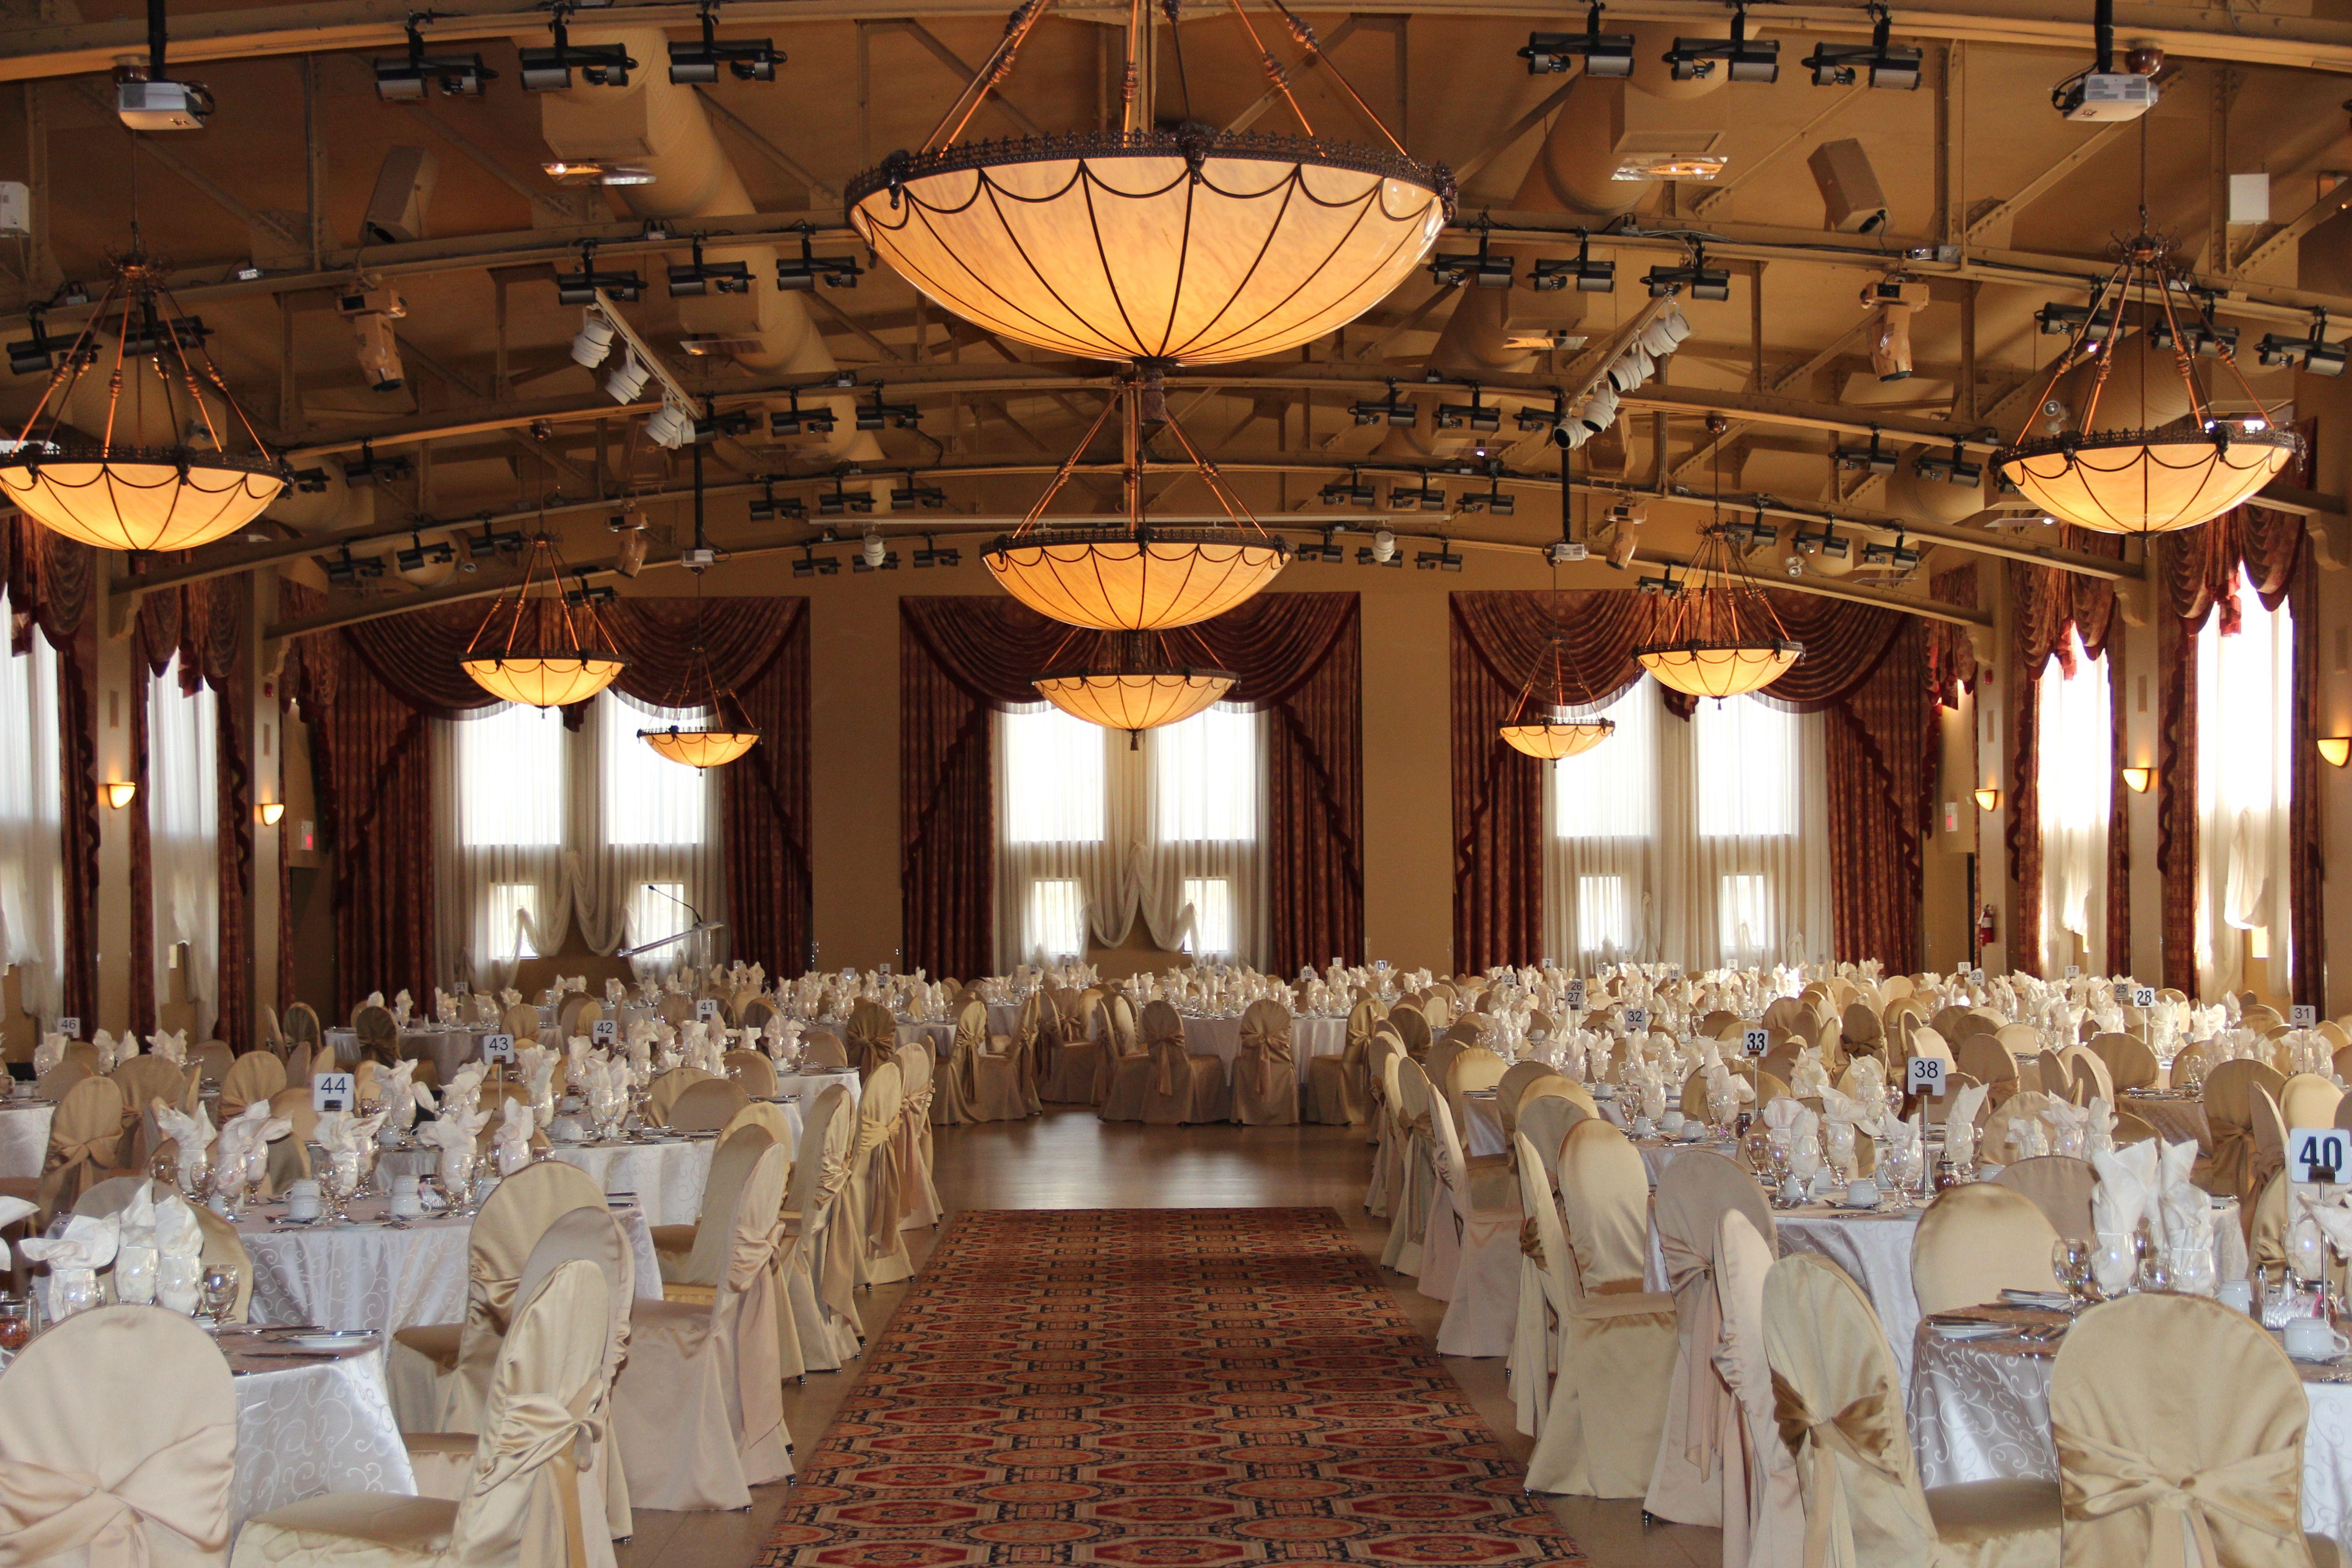 Grand Central Ballroom. Liuna Station. Hamilton Ontario